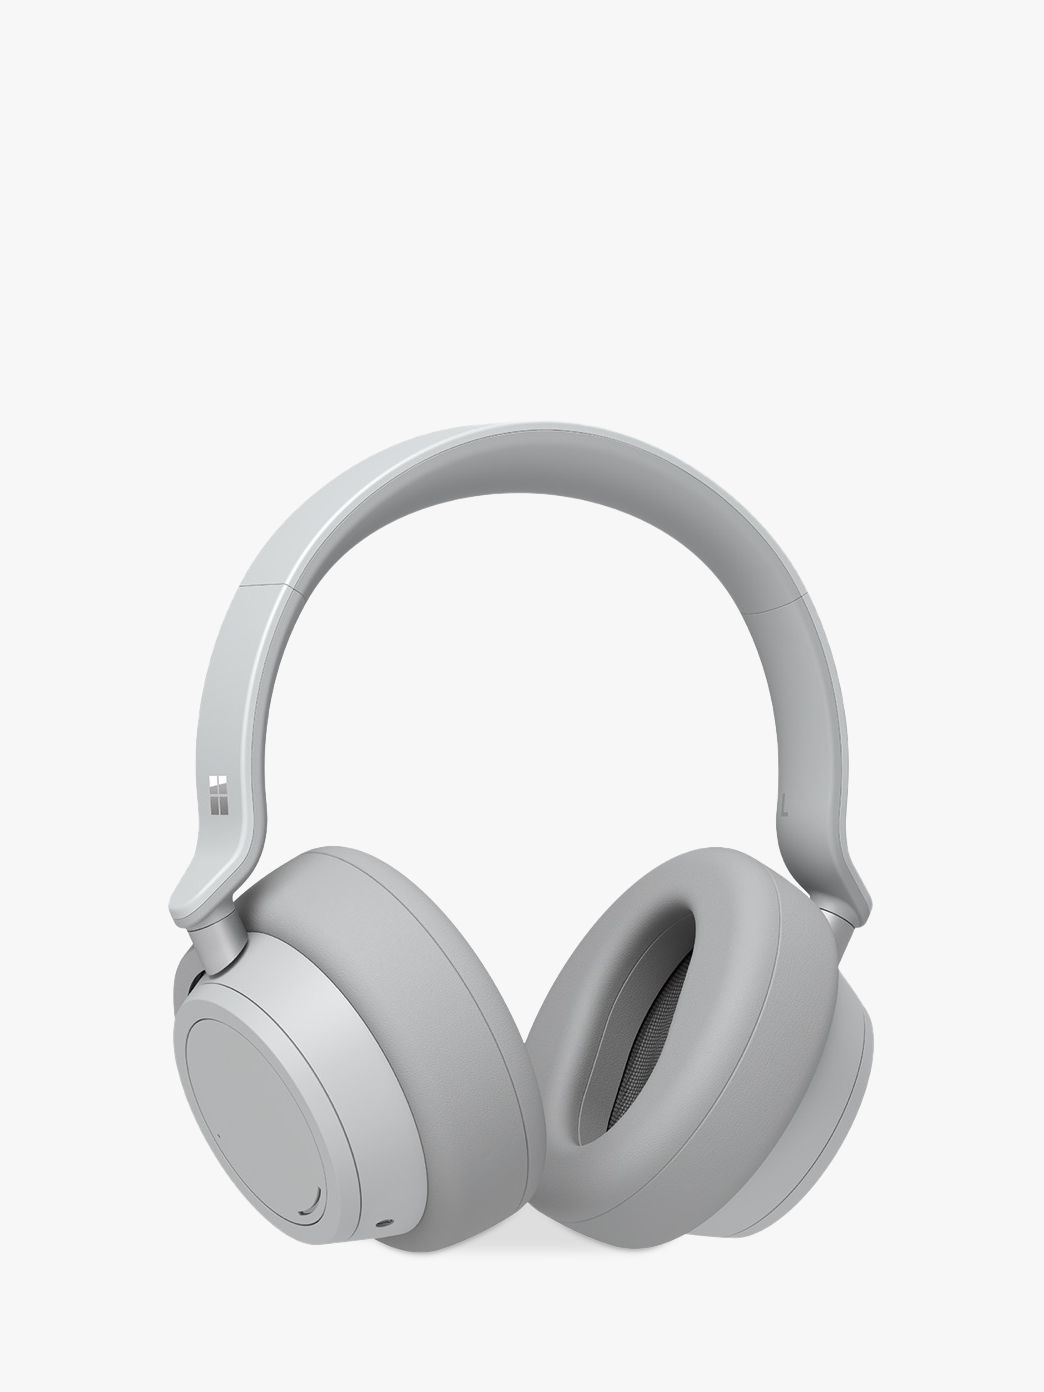 Microsoft Microsoft Surface Noise Cancelling Headphones, Platinum